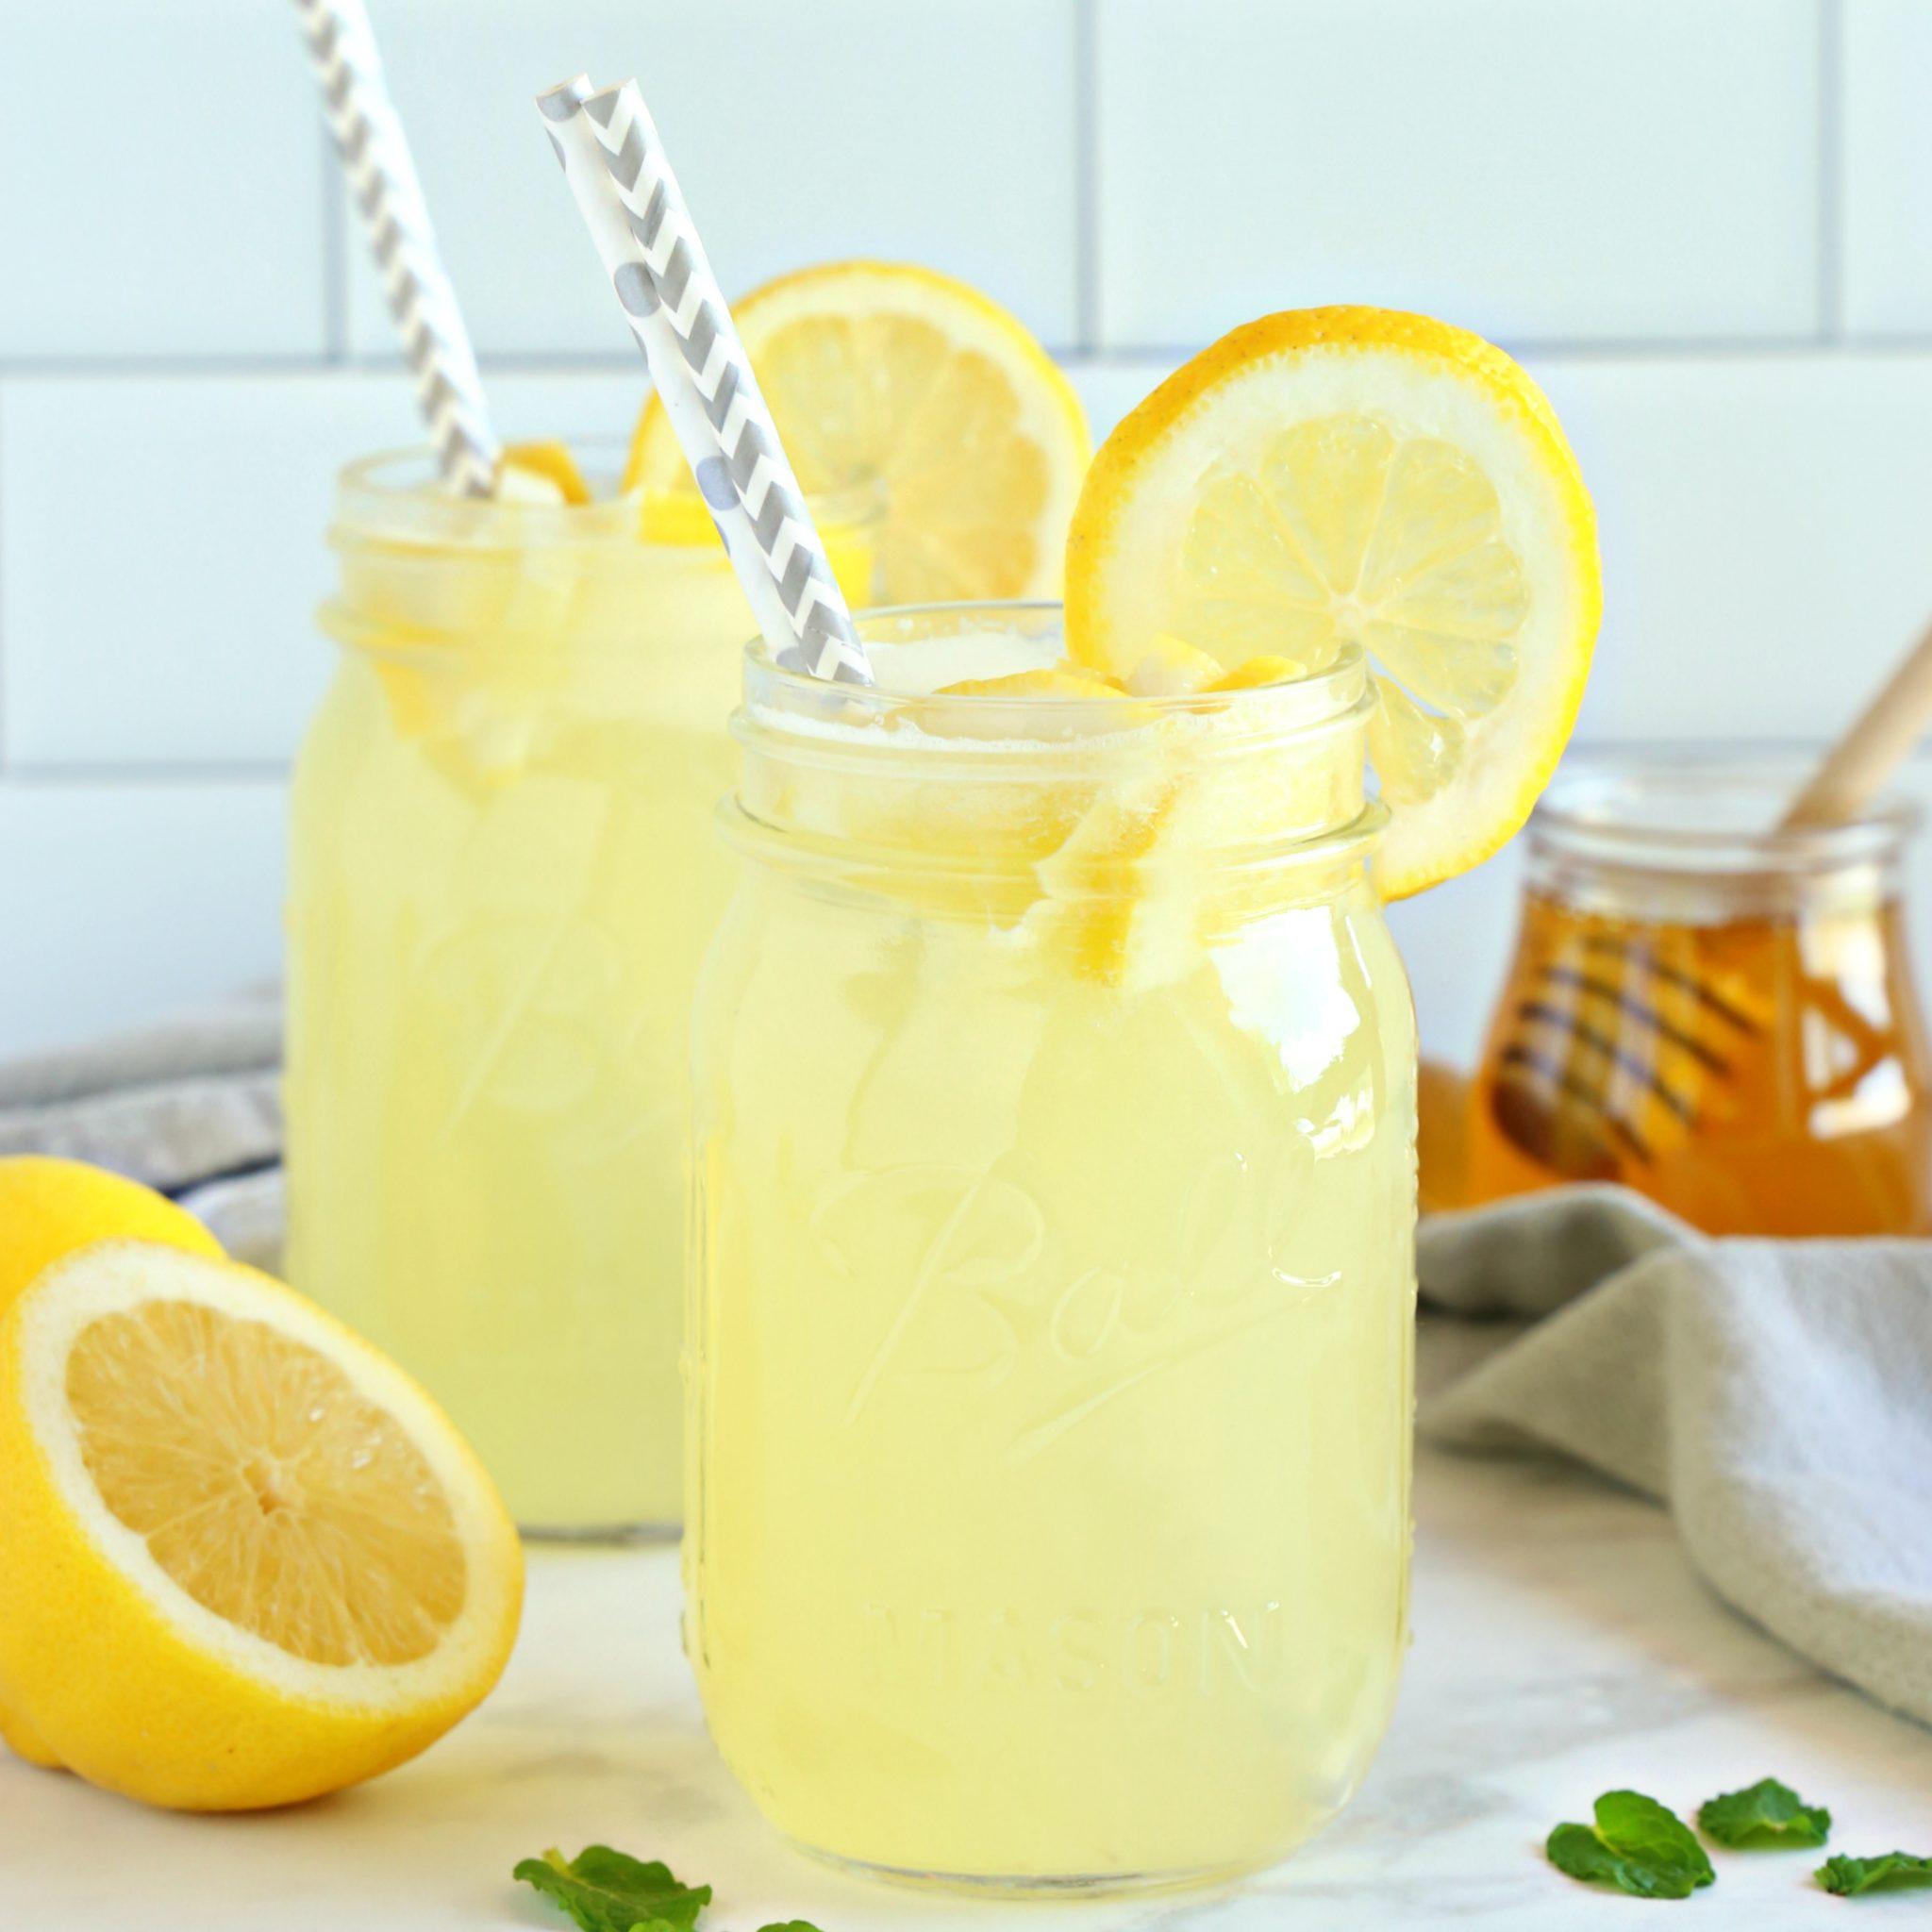 Healthy 3 Ingredient Lemonade Refined Sugar Free The Busy Baker